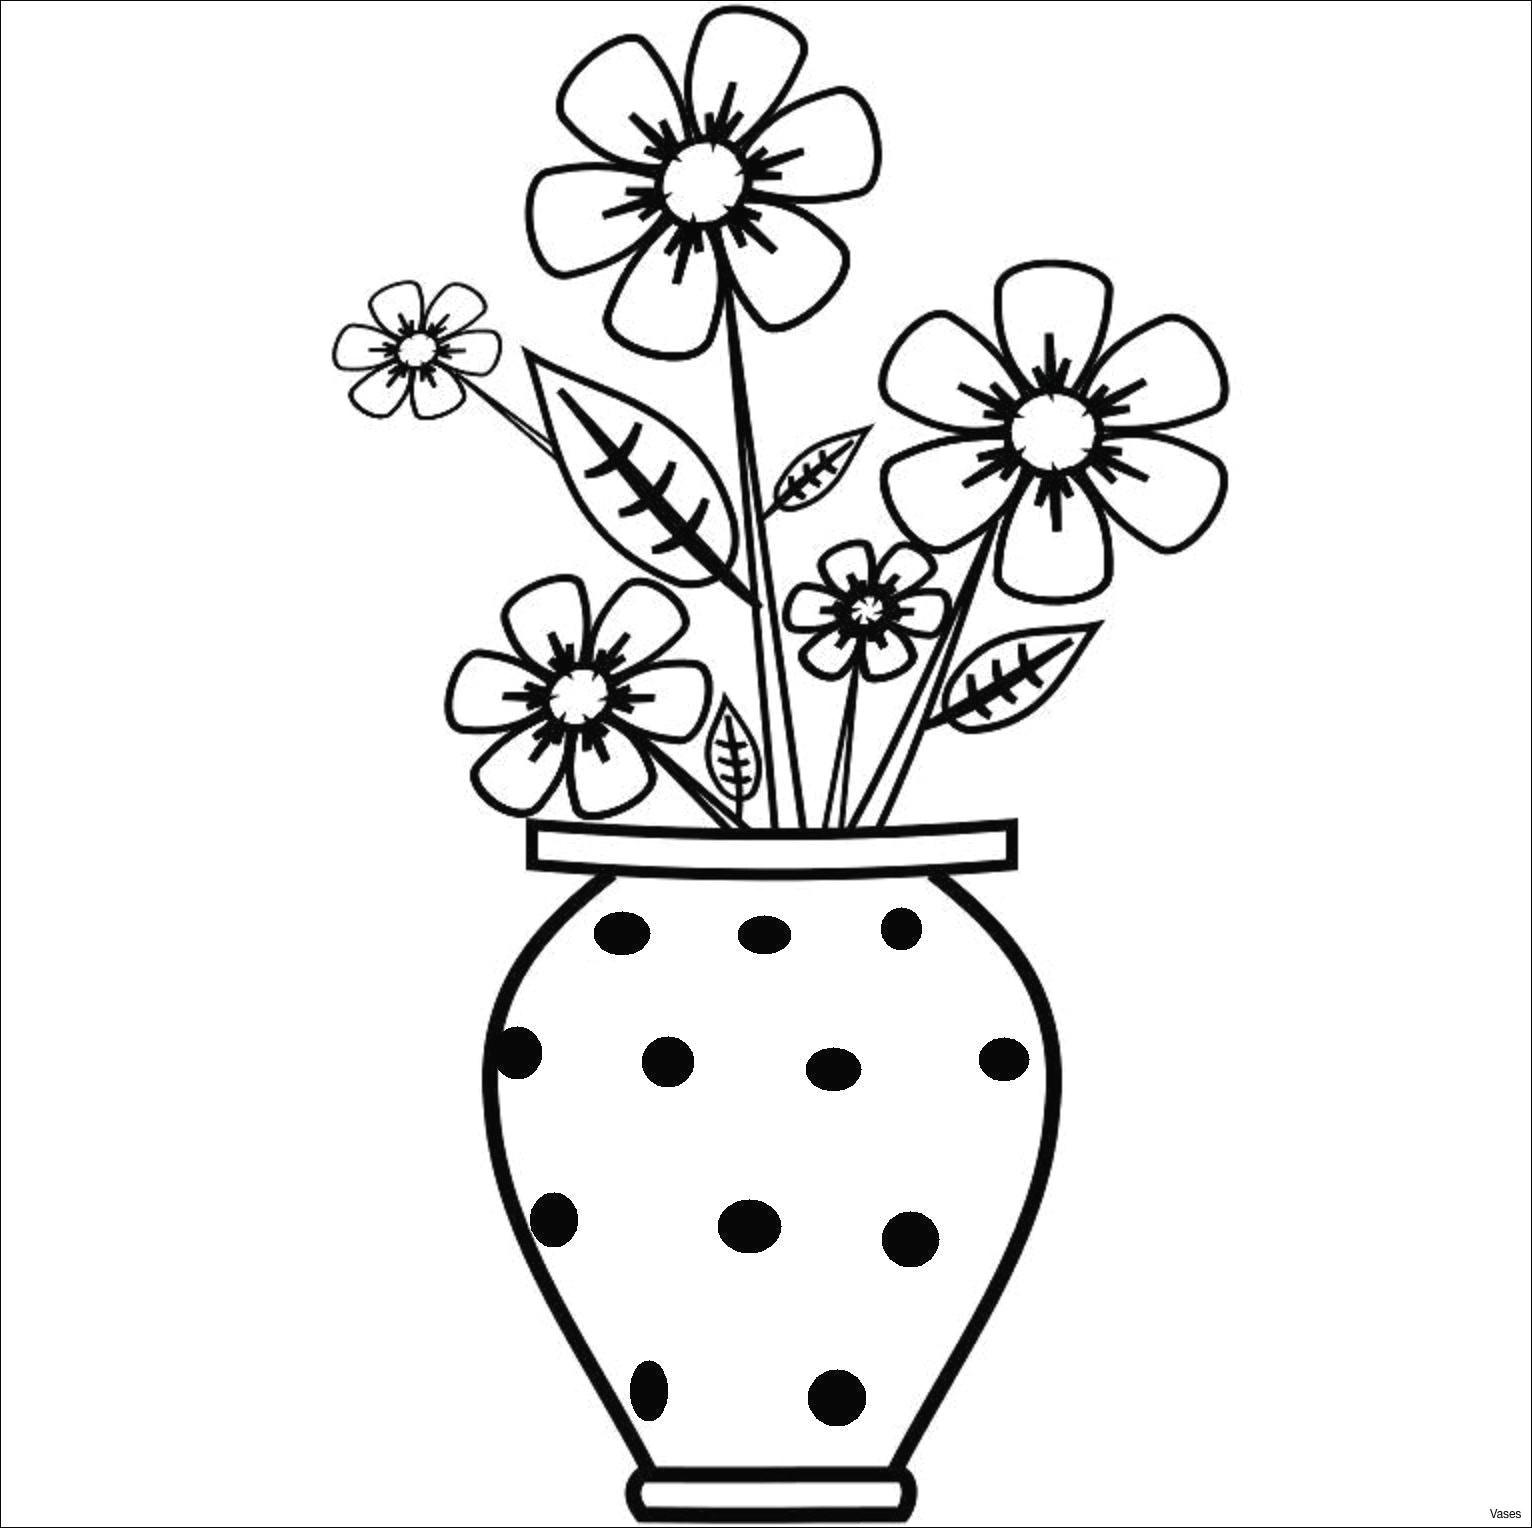 flower clipart black and white unique doodle bouquet od flowers and